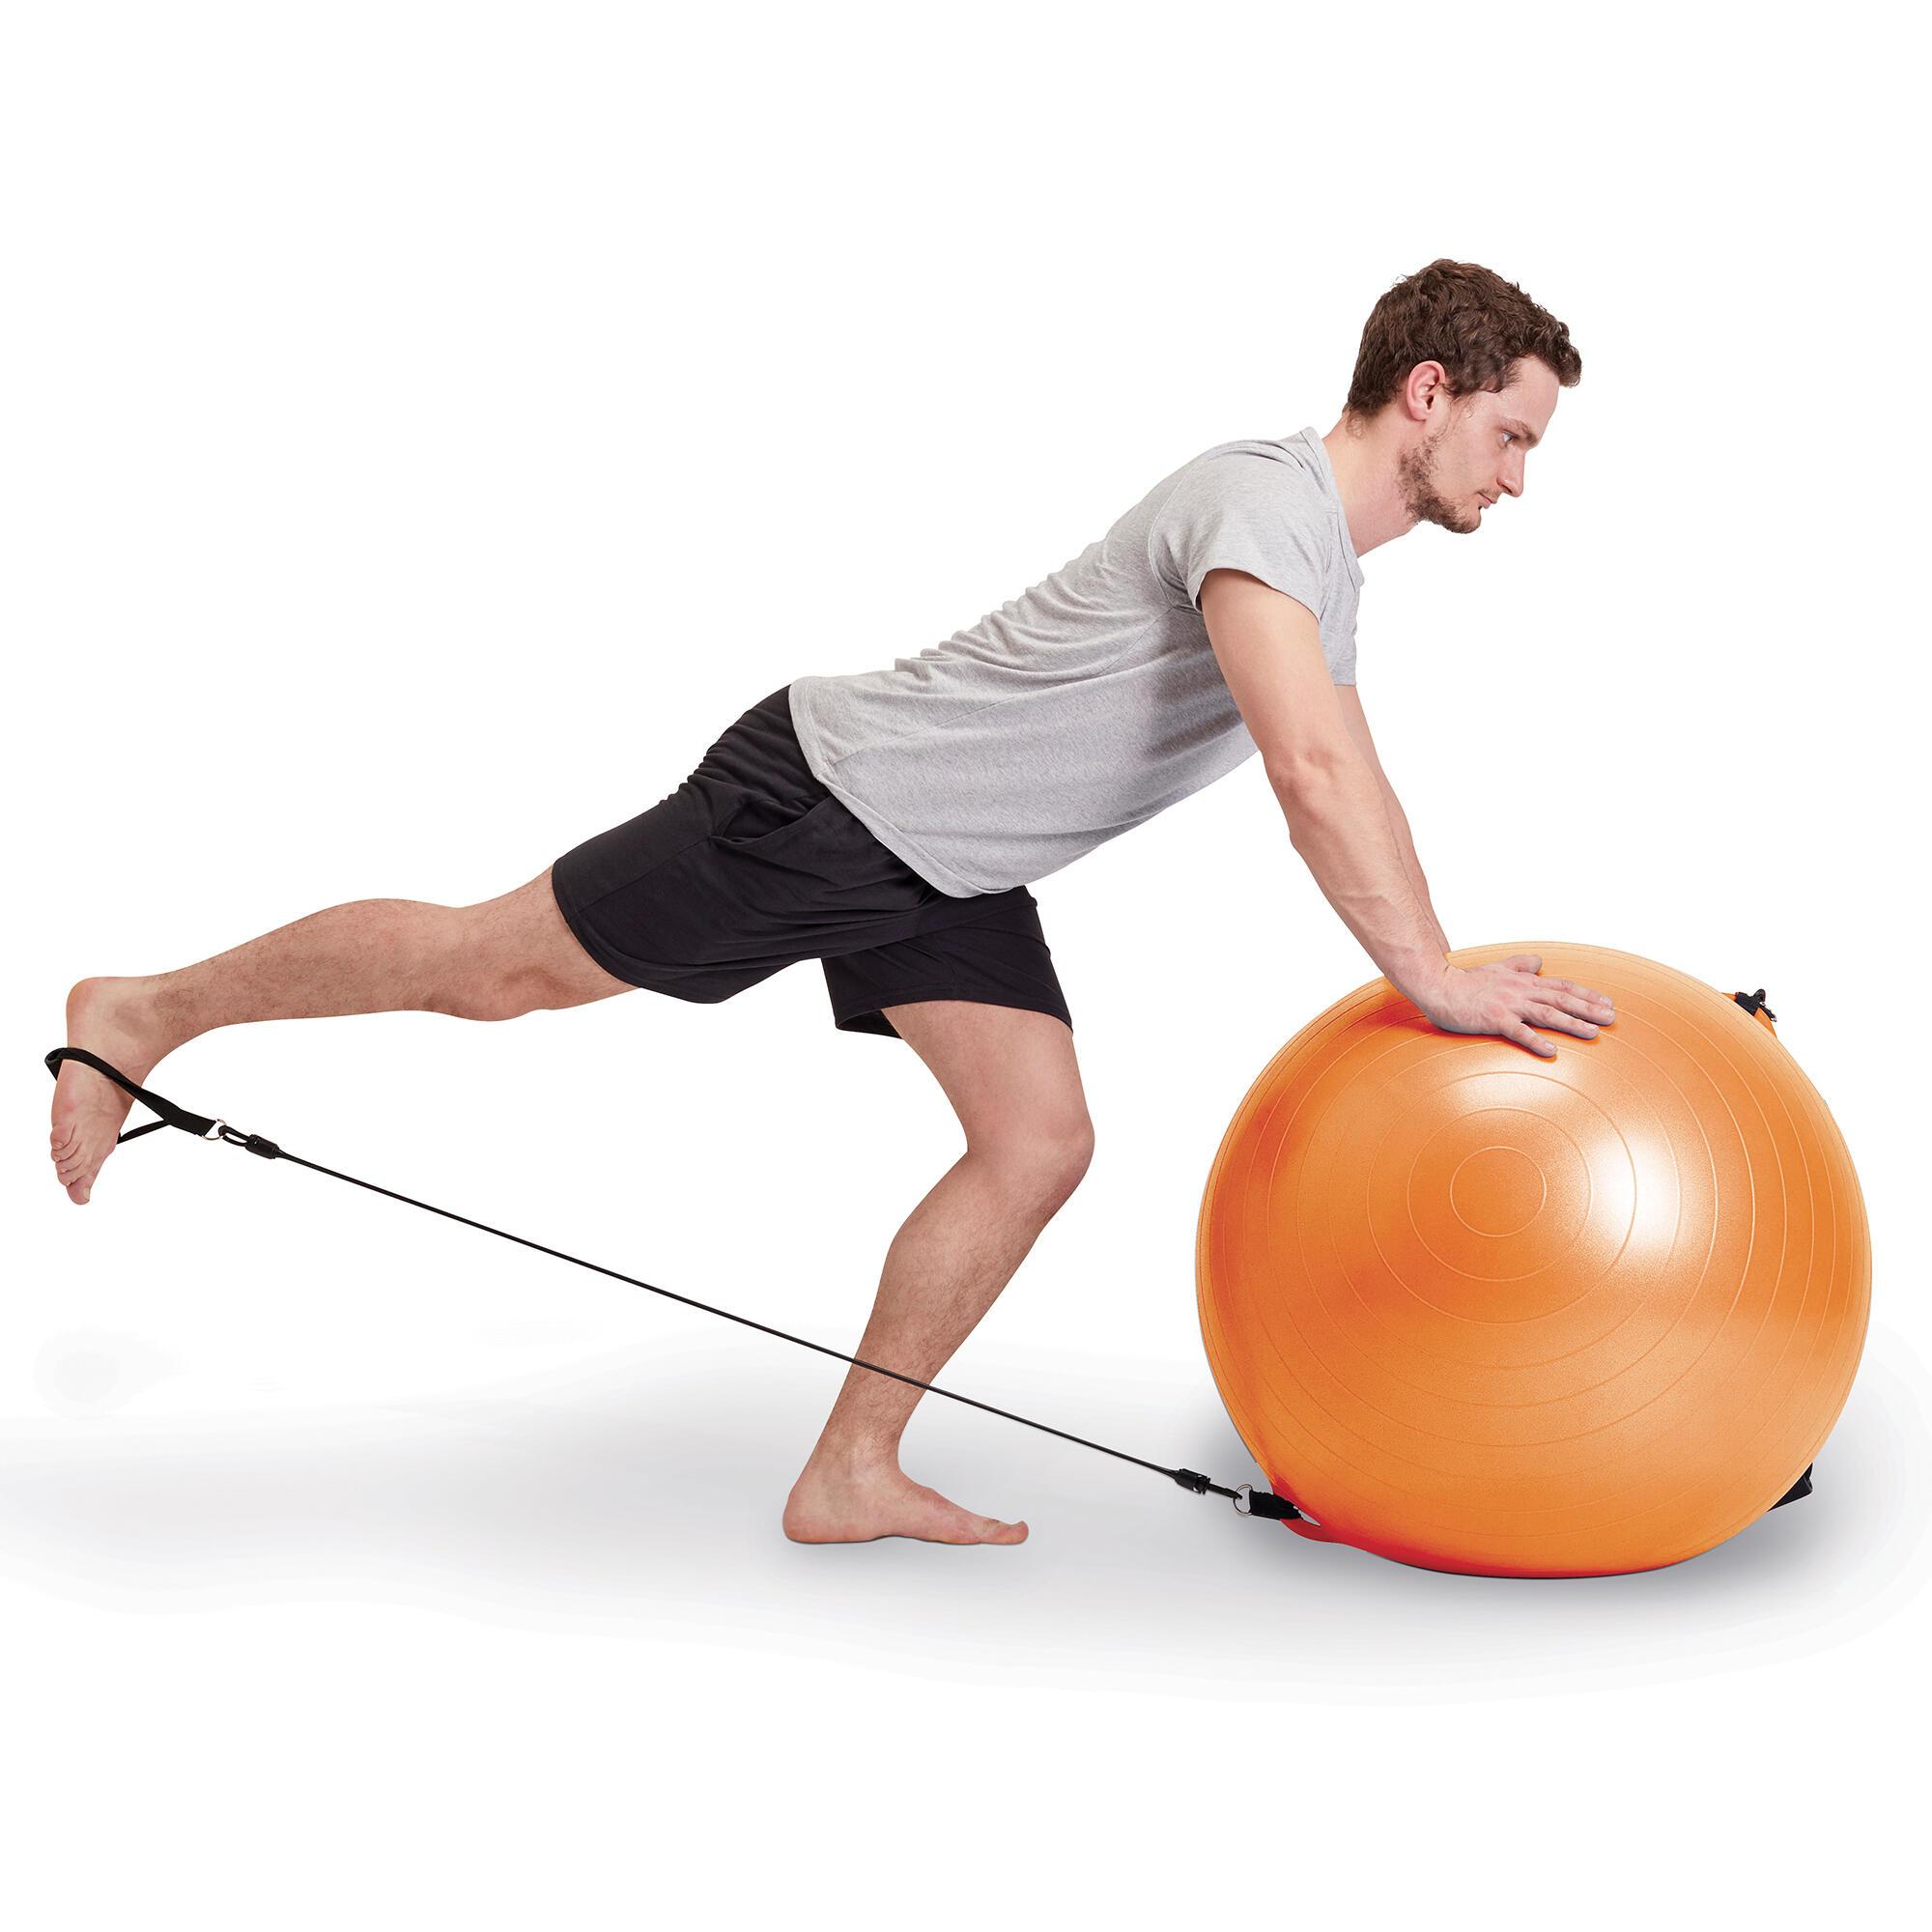 Comprar Fitball y Pelotas de Pilates Online  cc26a30bd500